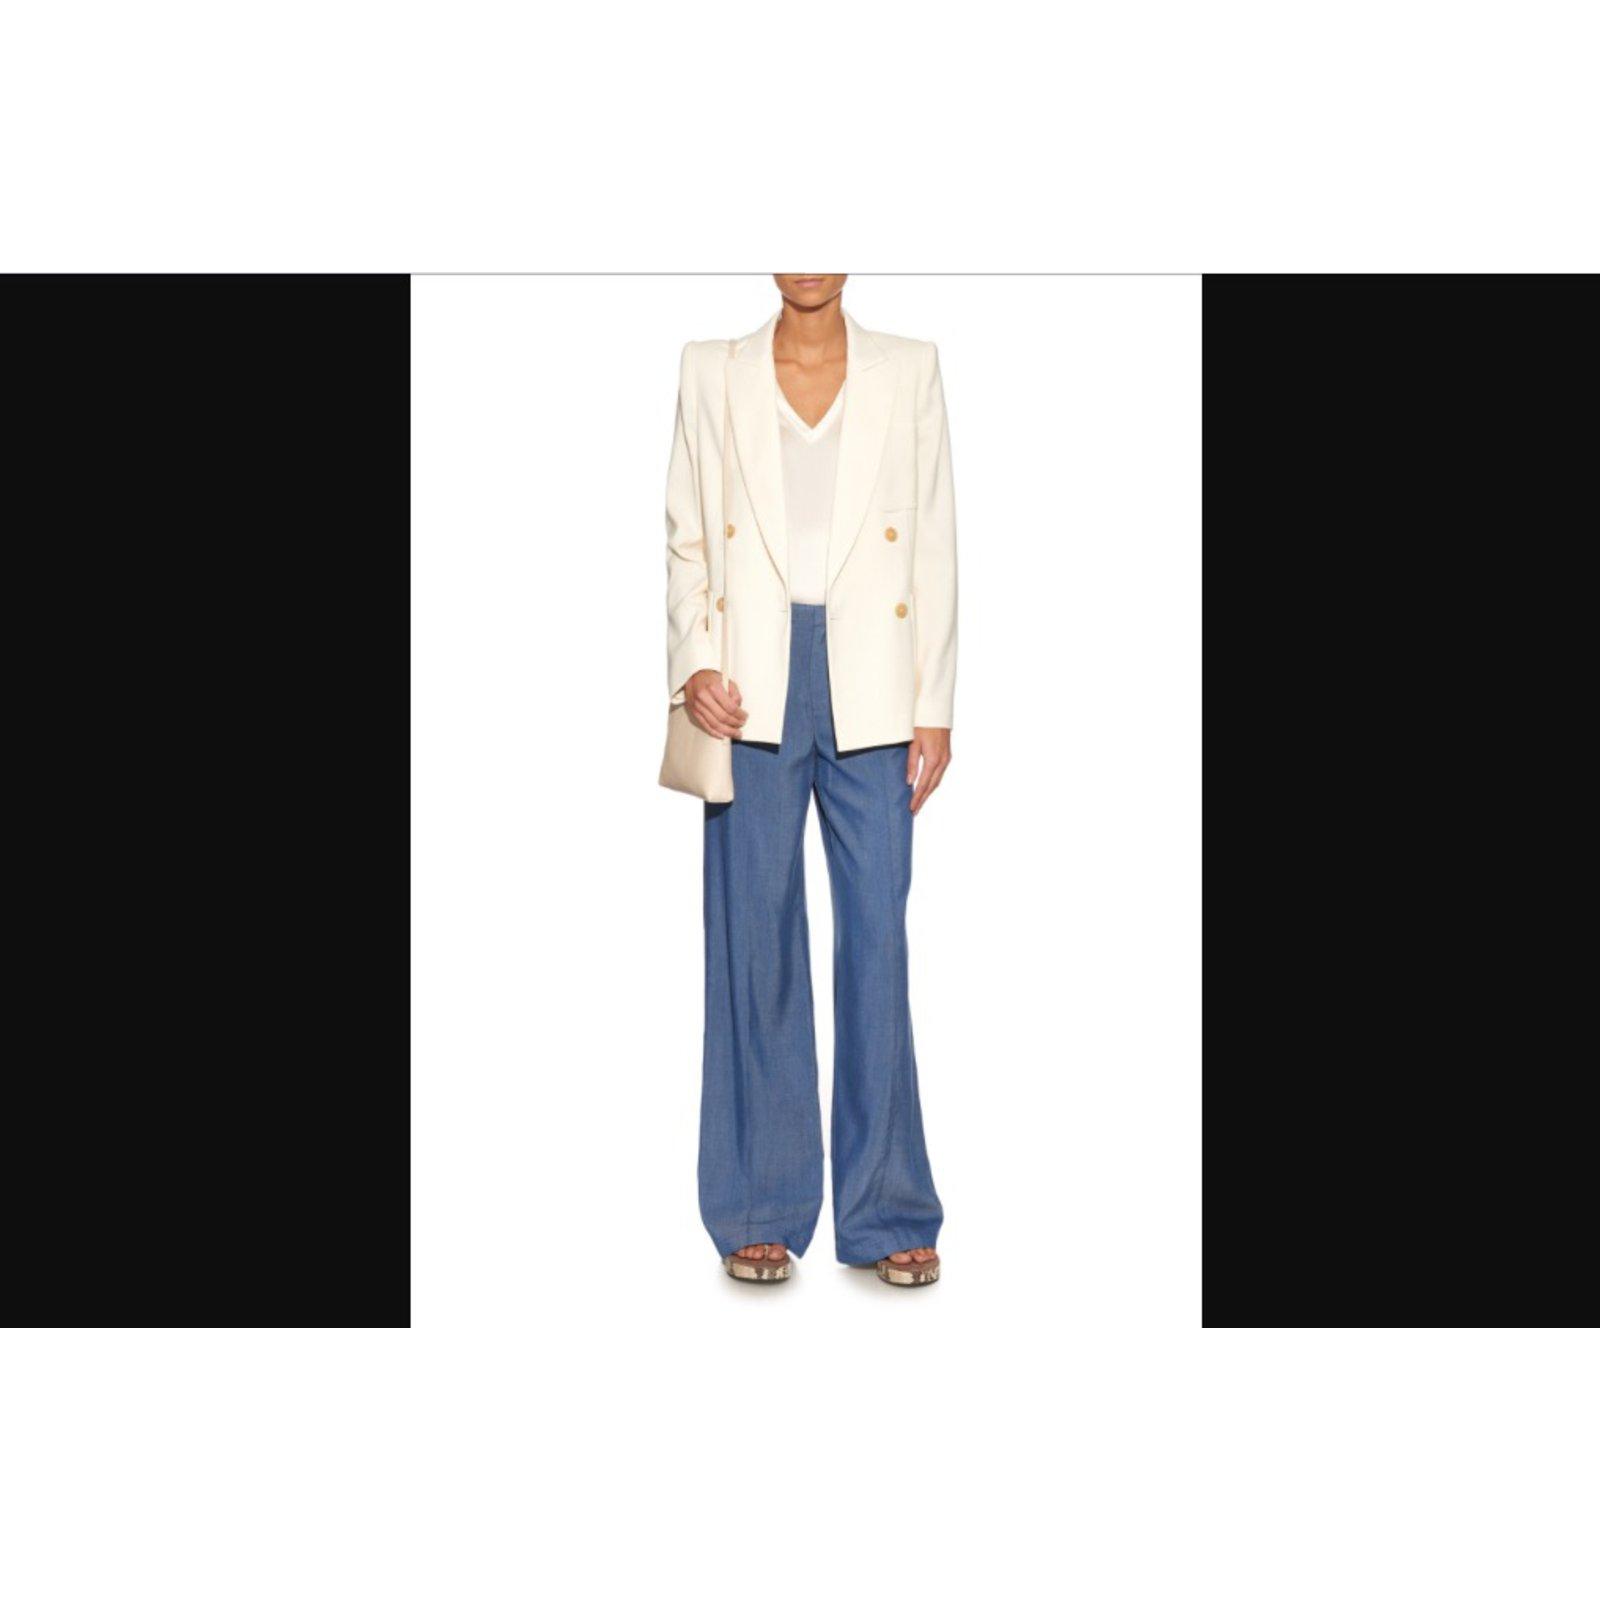 e841ca49862 Isabel Marant Jacket Jackets Viscose White ref.34291 - Joli Closet